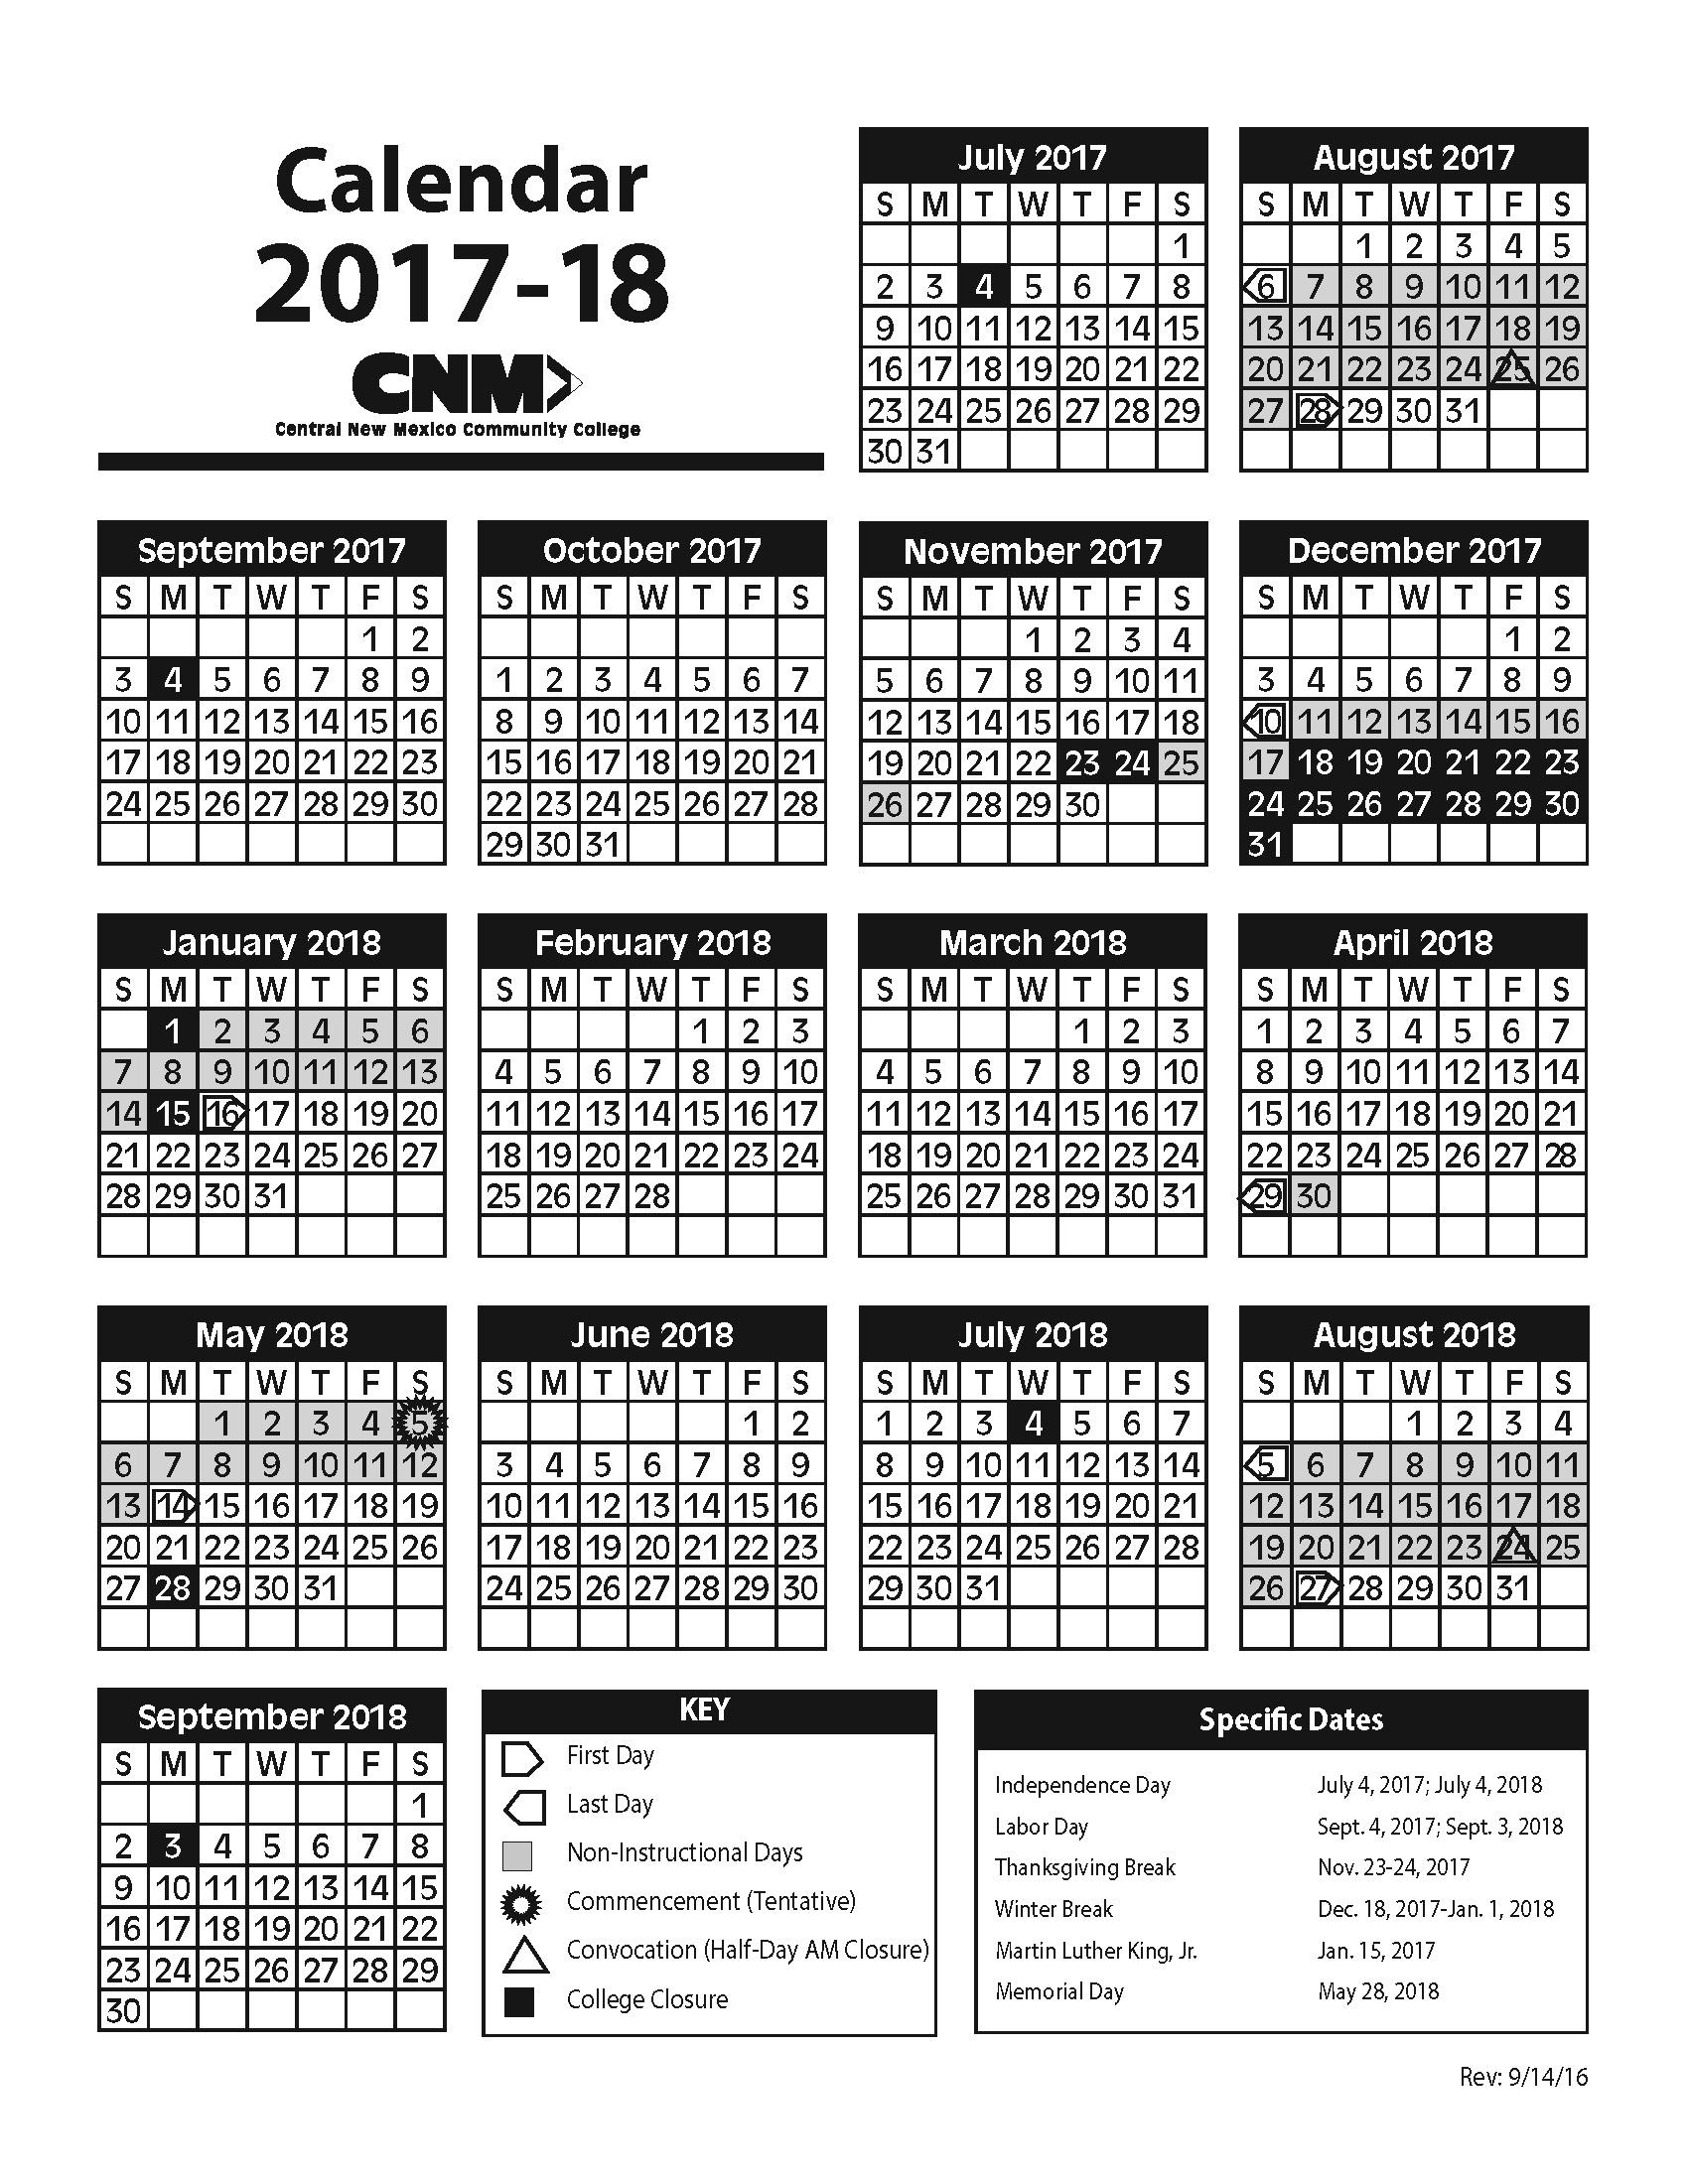 2017-2018 Academic Calendar image